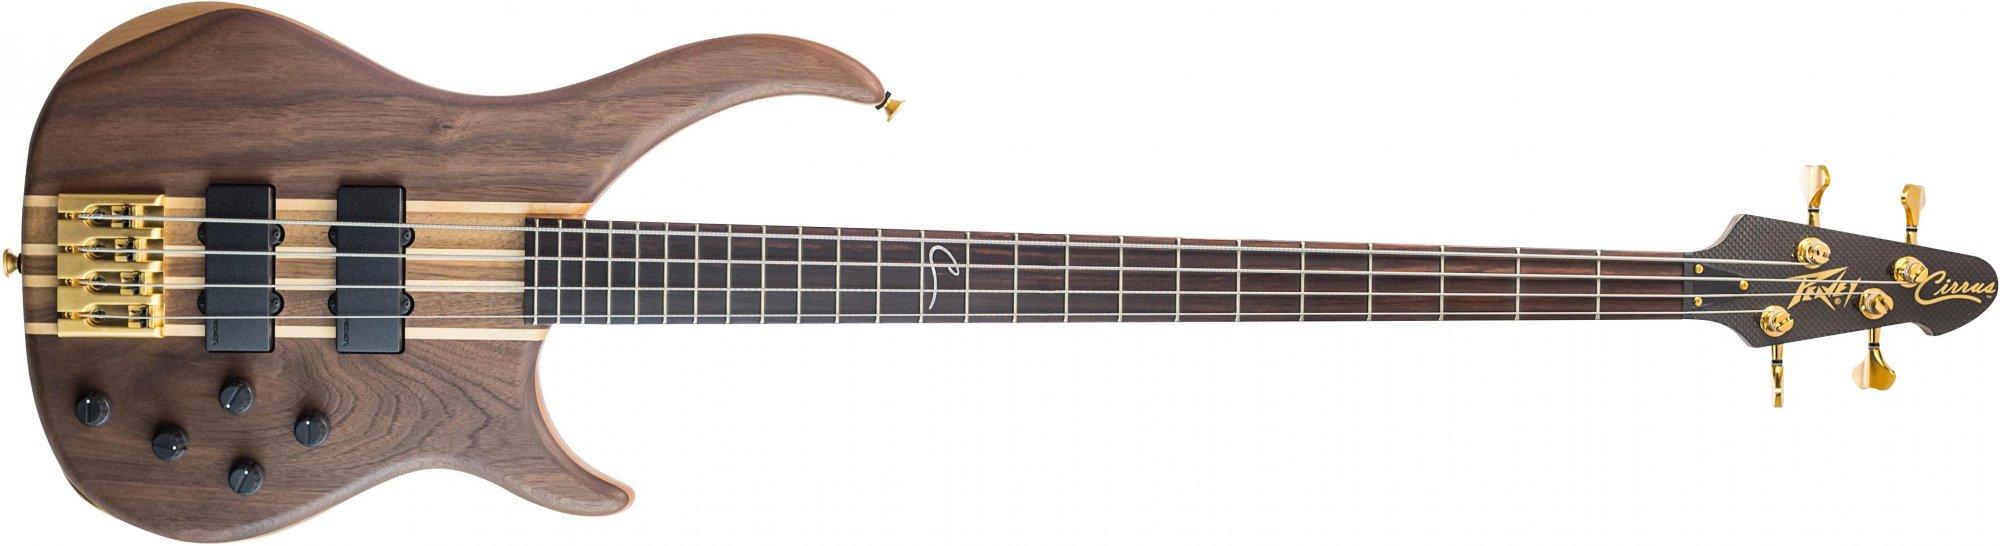 peavey cirrus 4 walnut 4 string bass guitar. Black Bedroom Furniture Sets. Home Design Ideas